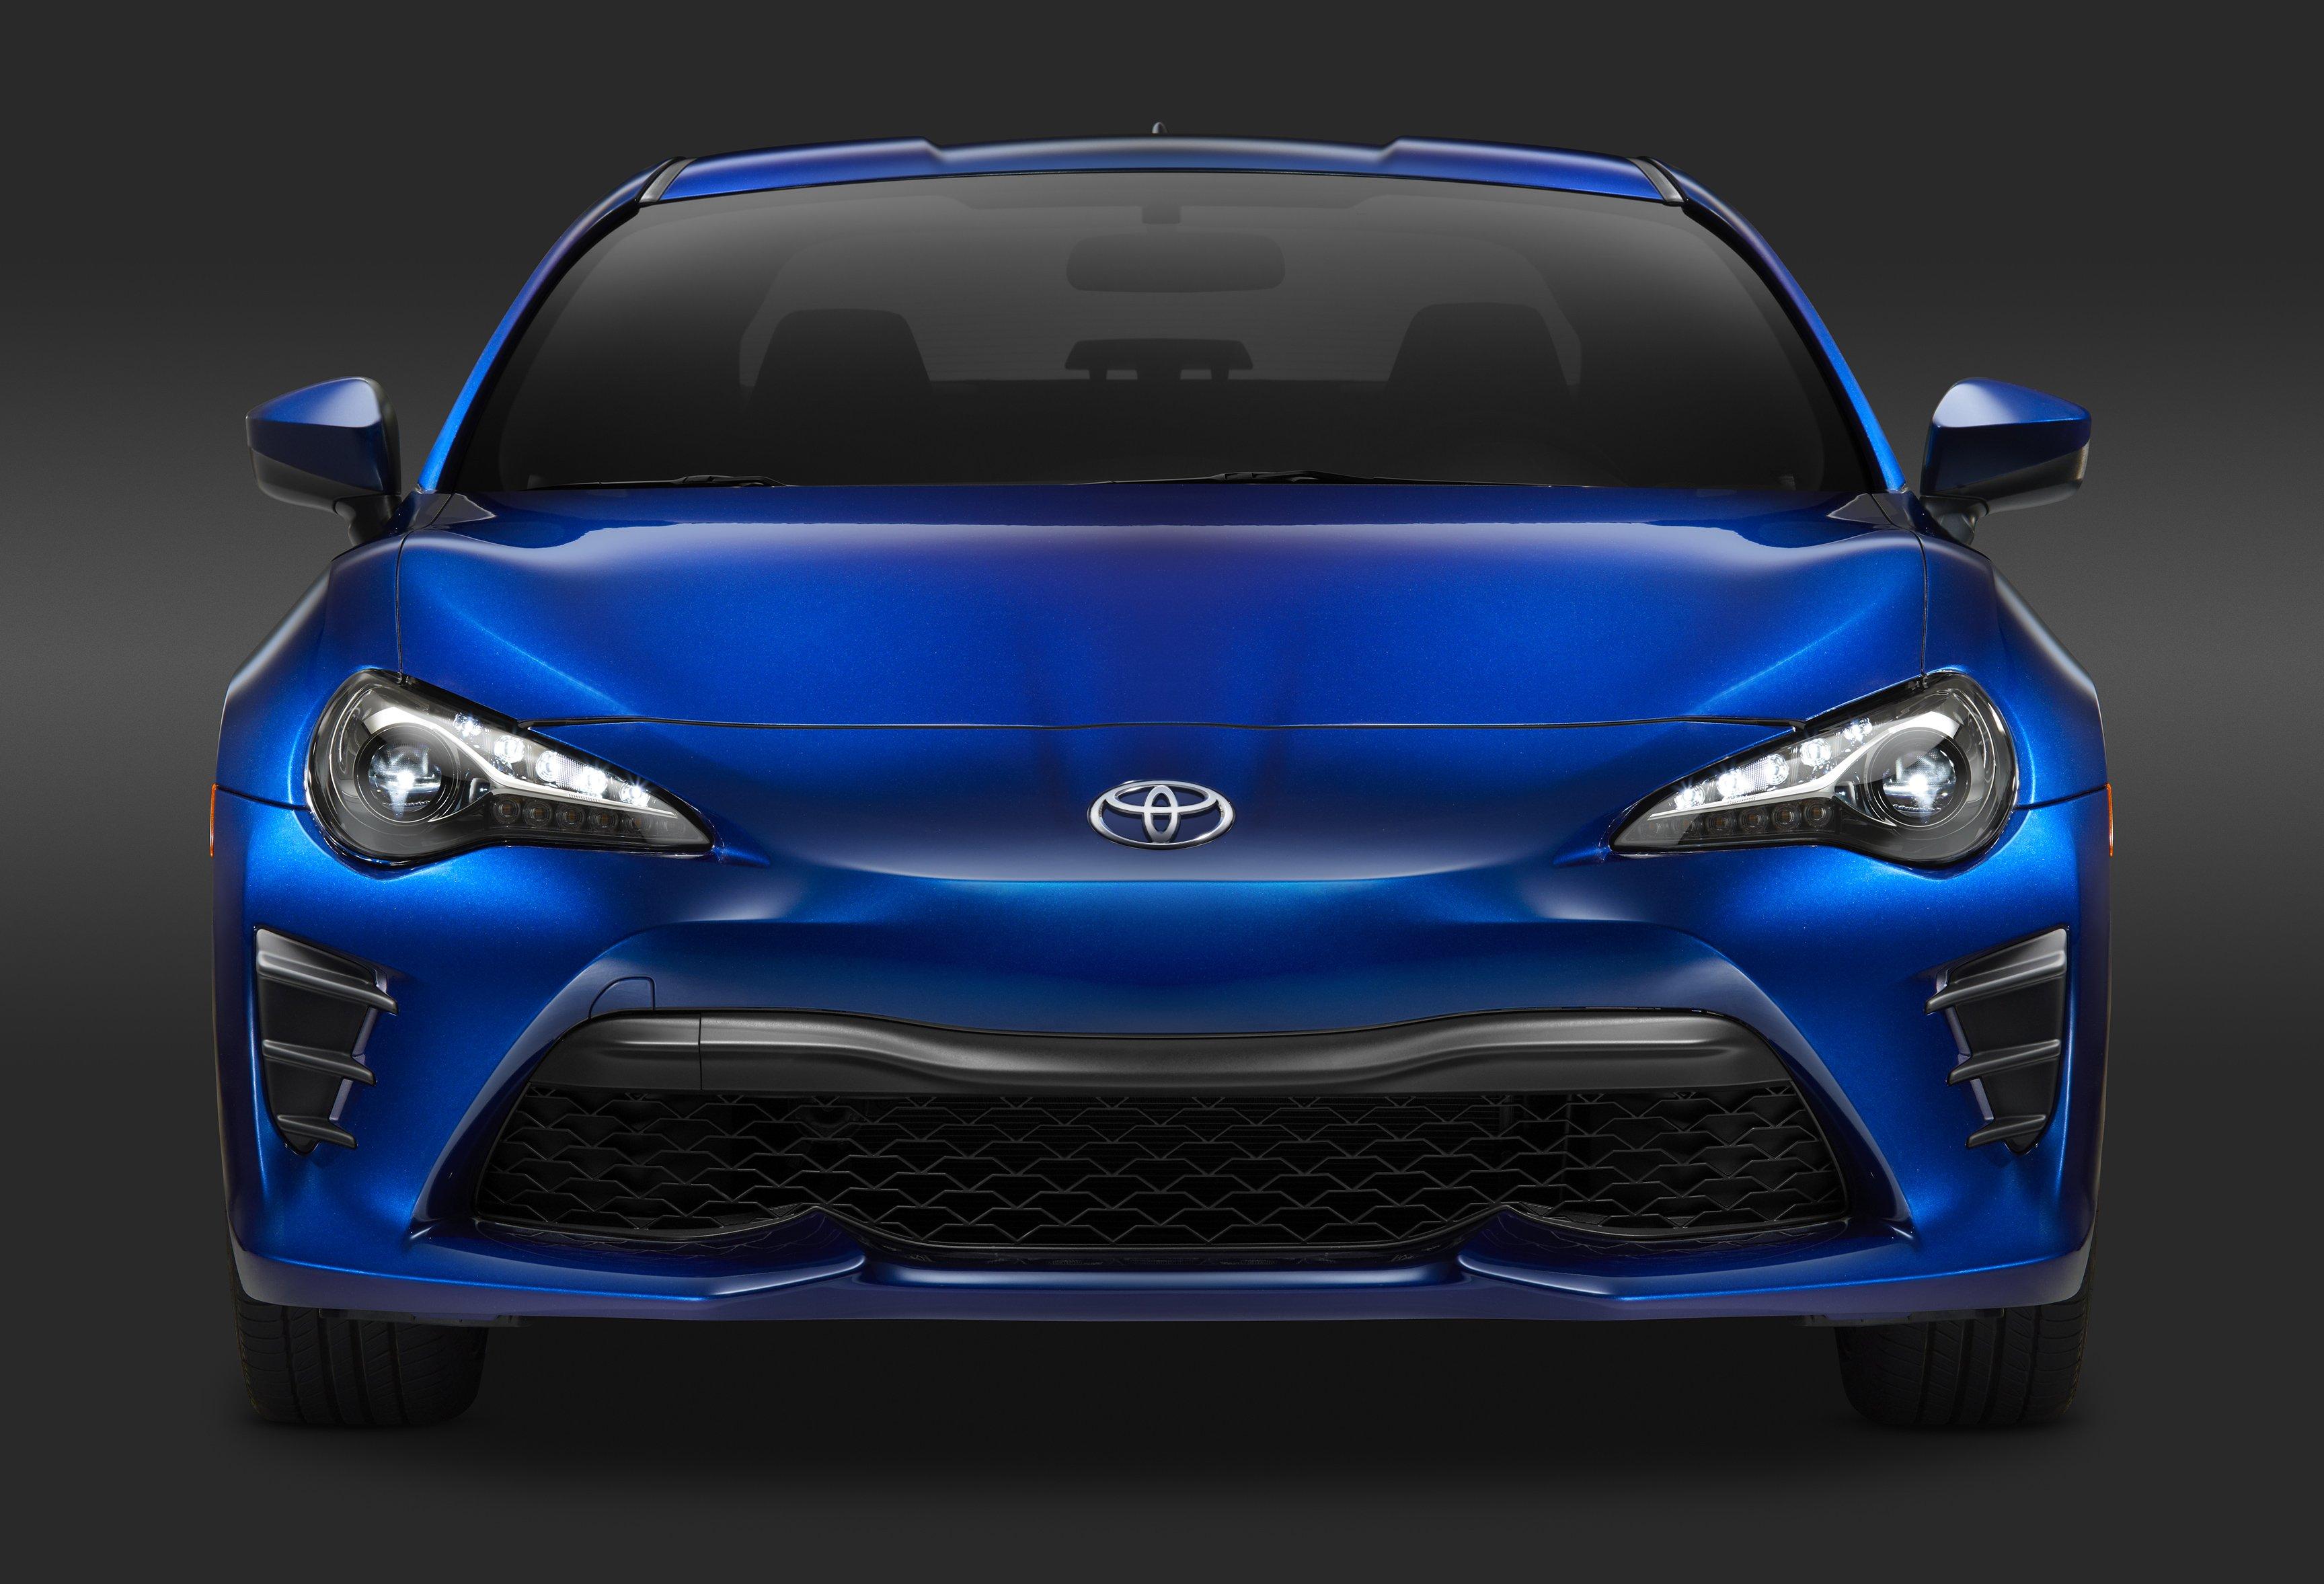 Back to Story: 2017 Toyota 86 facelift gets engine, handling upgrades